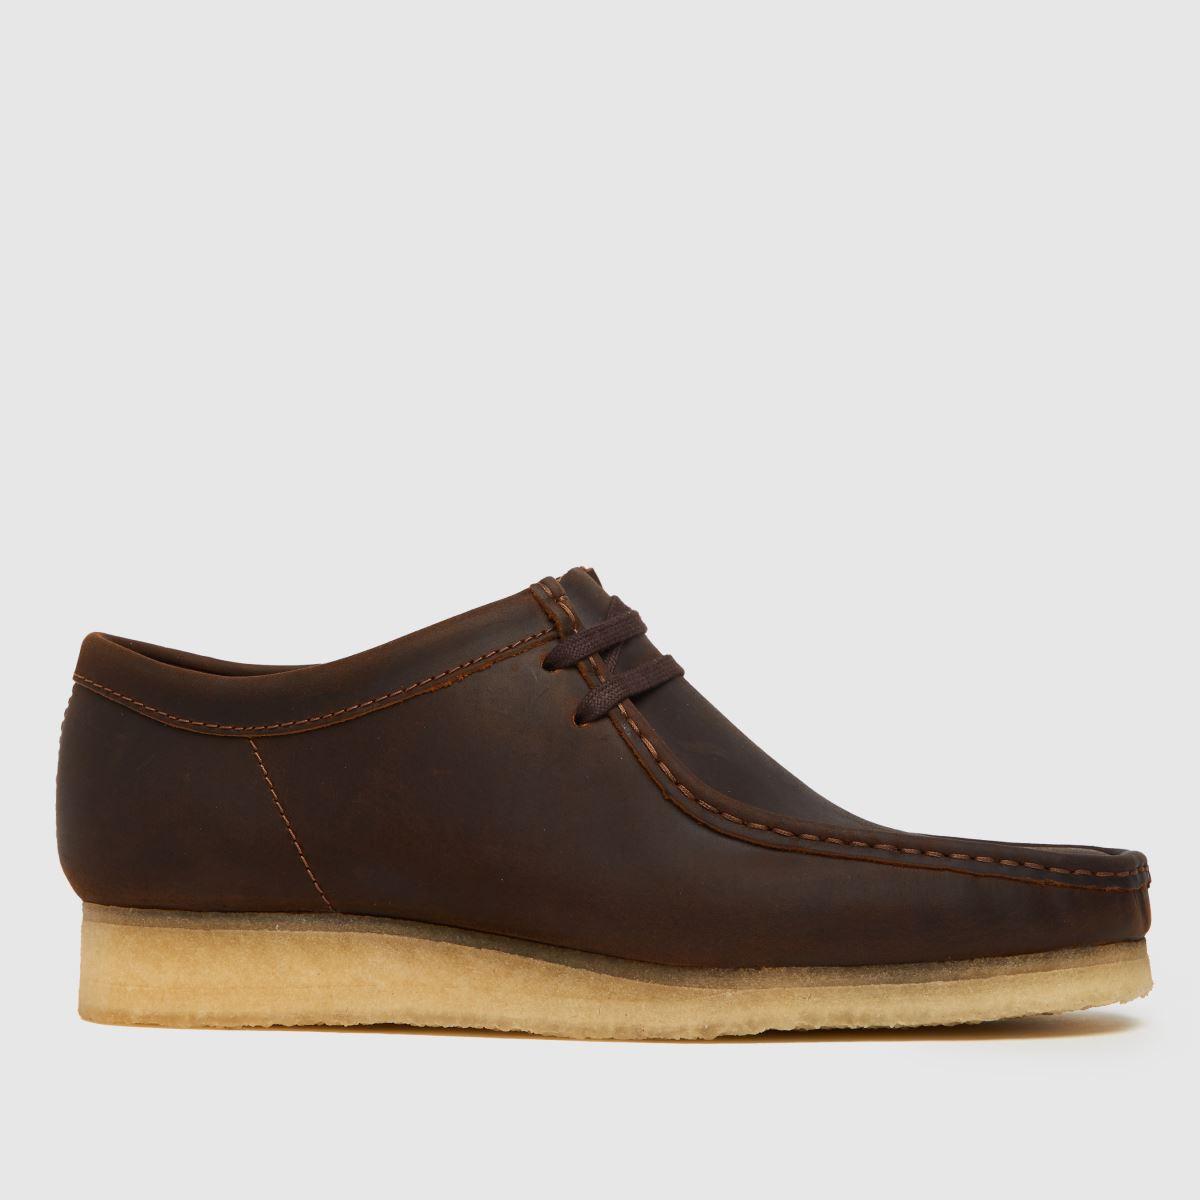 Clarks Originals Dark Brown Wallabee Shoes